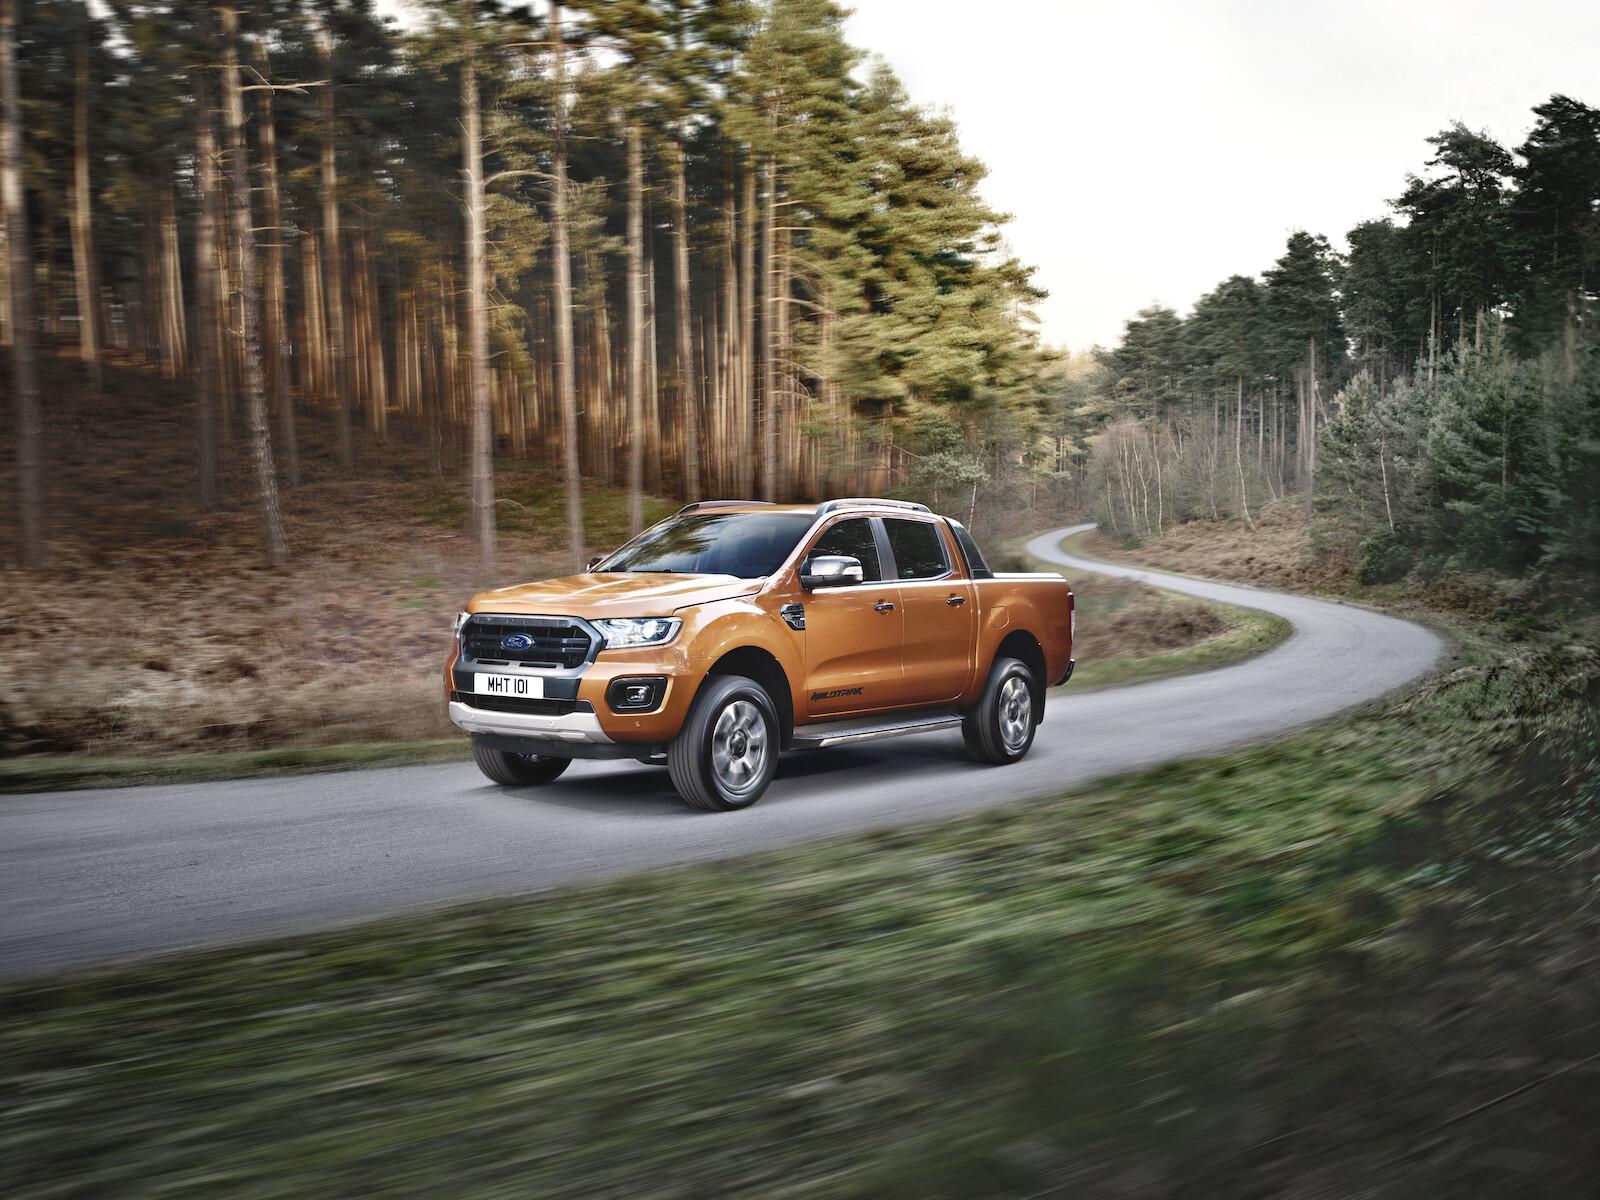 Foto de Ford Ranger Wildtrak 2021 (1/10)